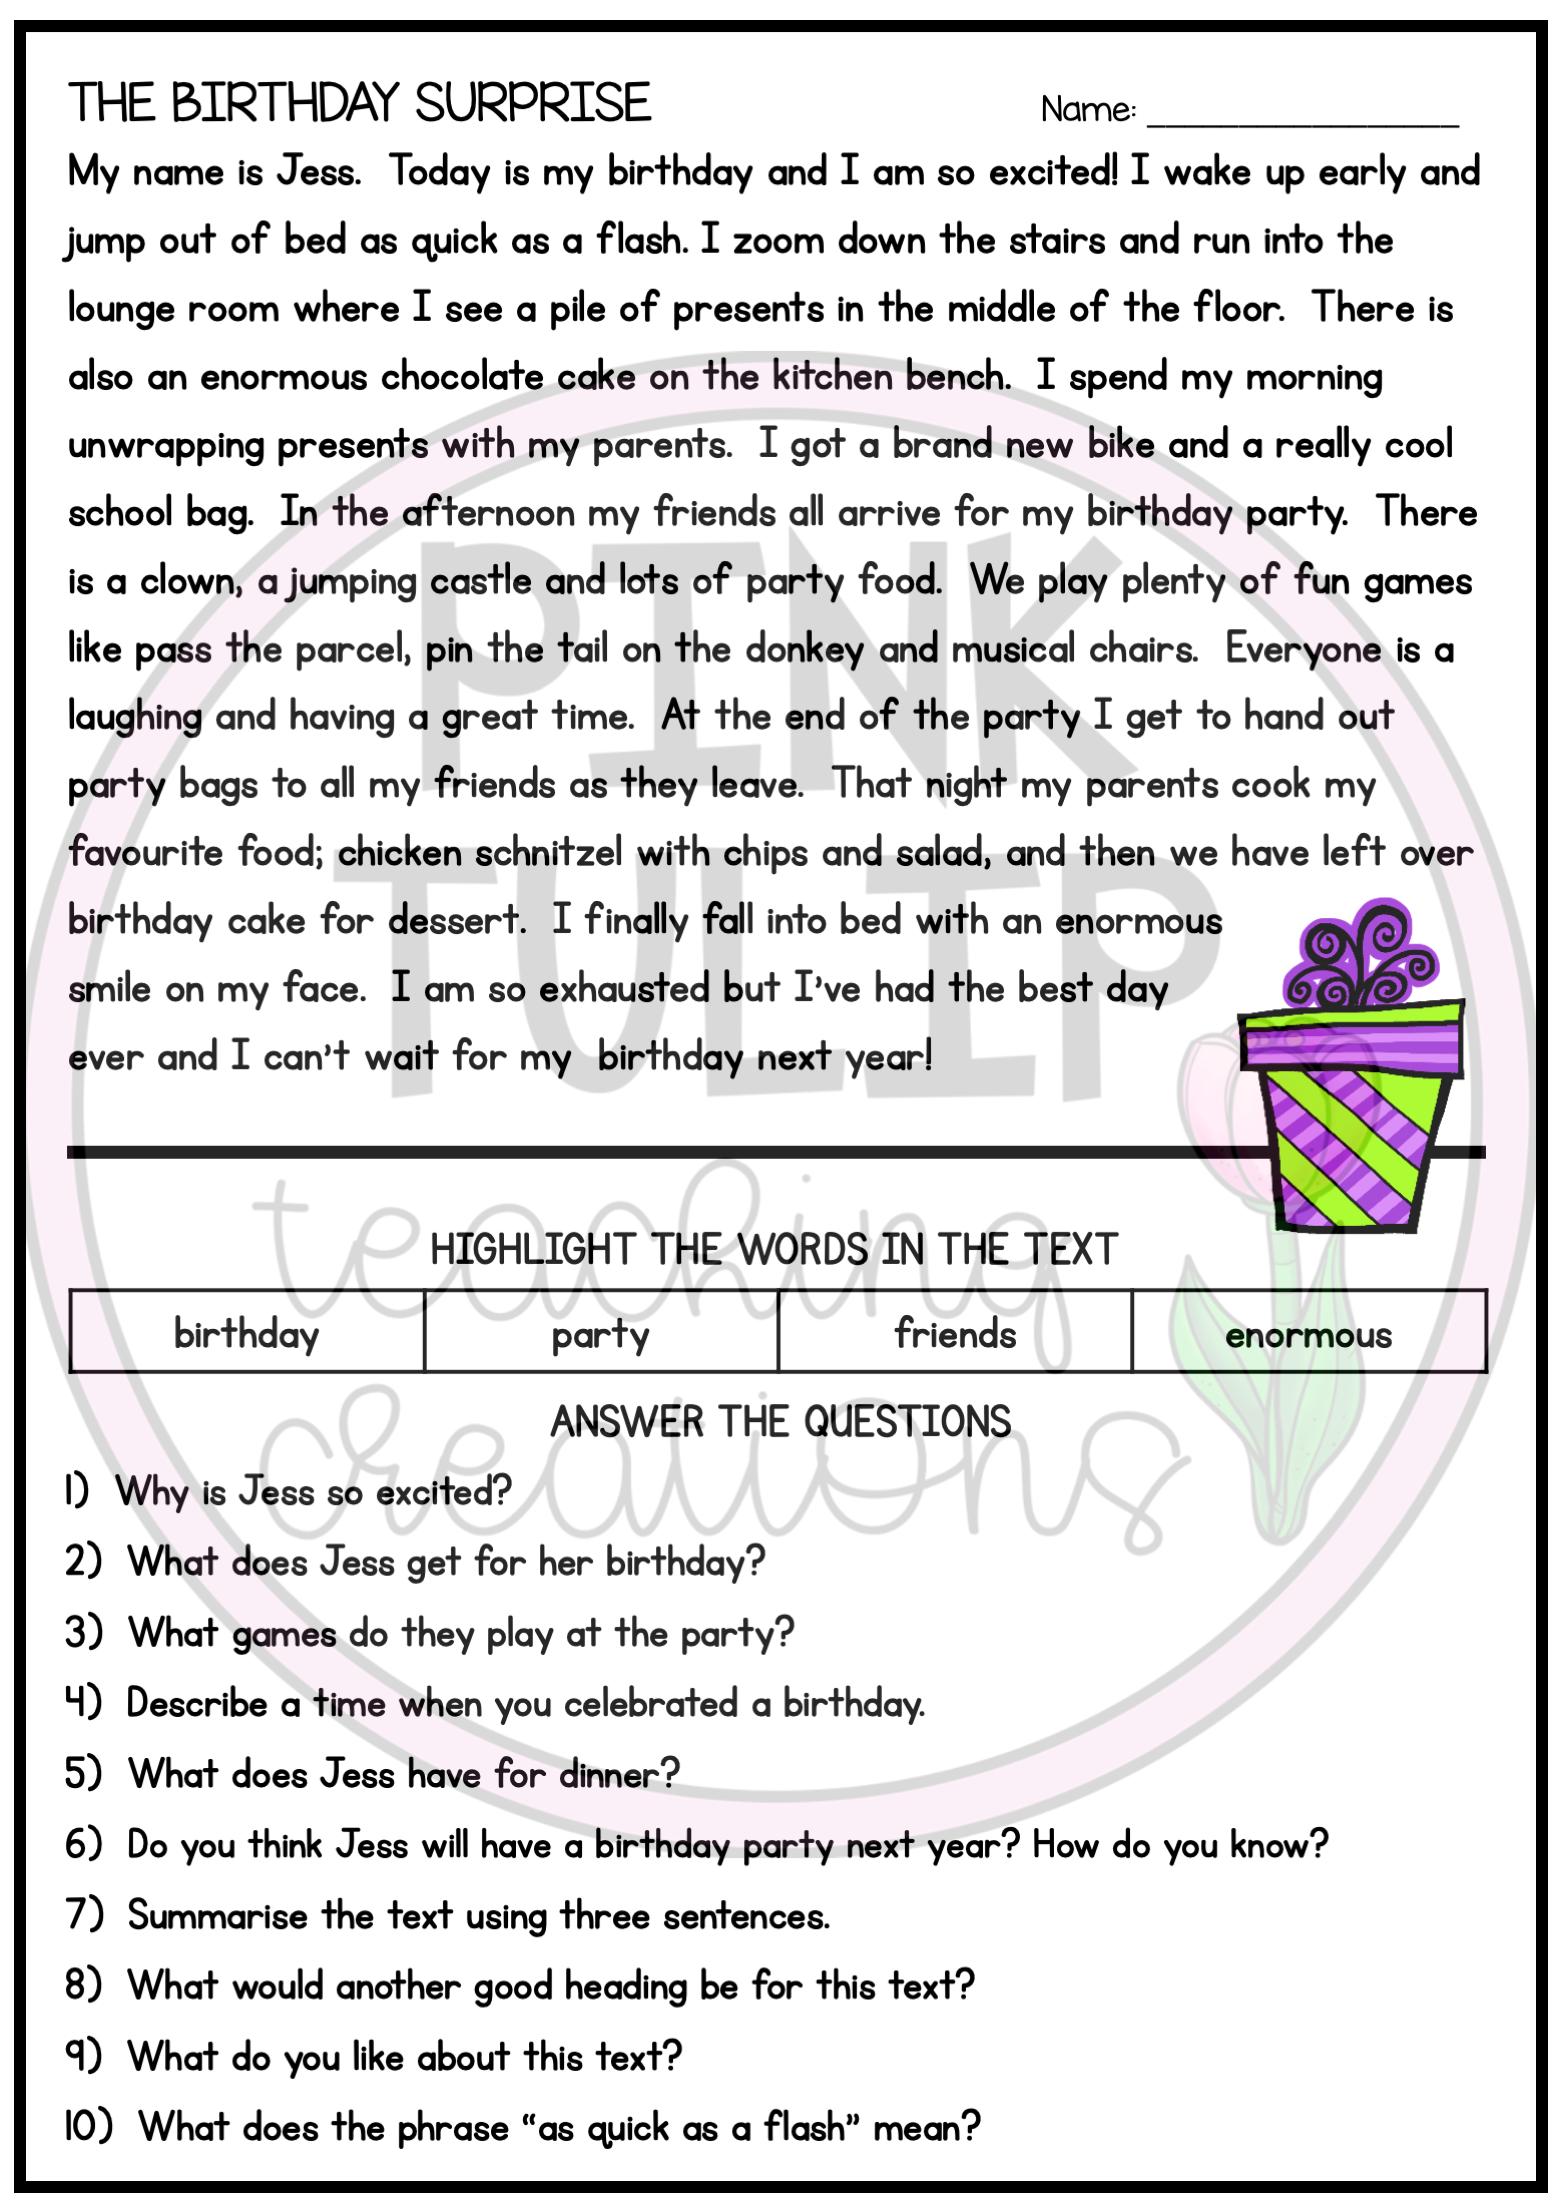 Ten Page Reading Comprehension Worksheet Pack Reading Comprehension Worksheets Reading Comprehension Reading Comprehension Resources [ 2203 x 1557 Pixel ]